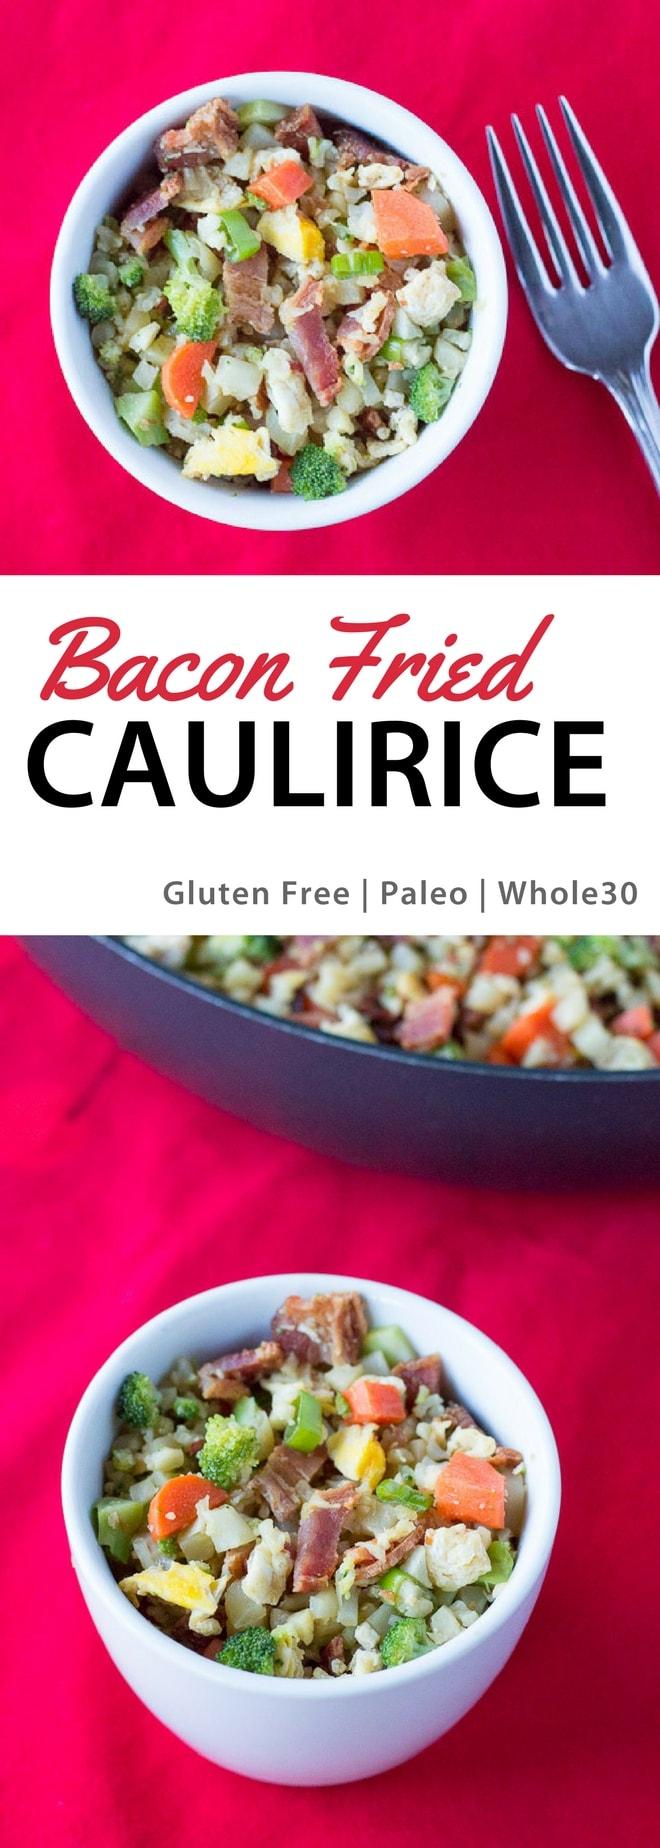 Bacon Fried Caulirice (Gluten Free, Paleo, Whole30)